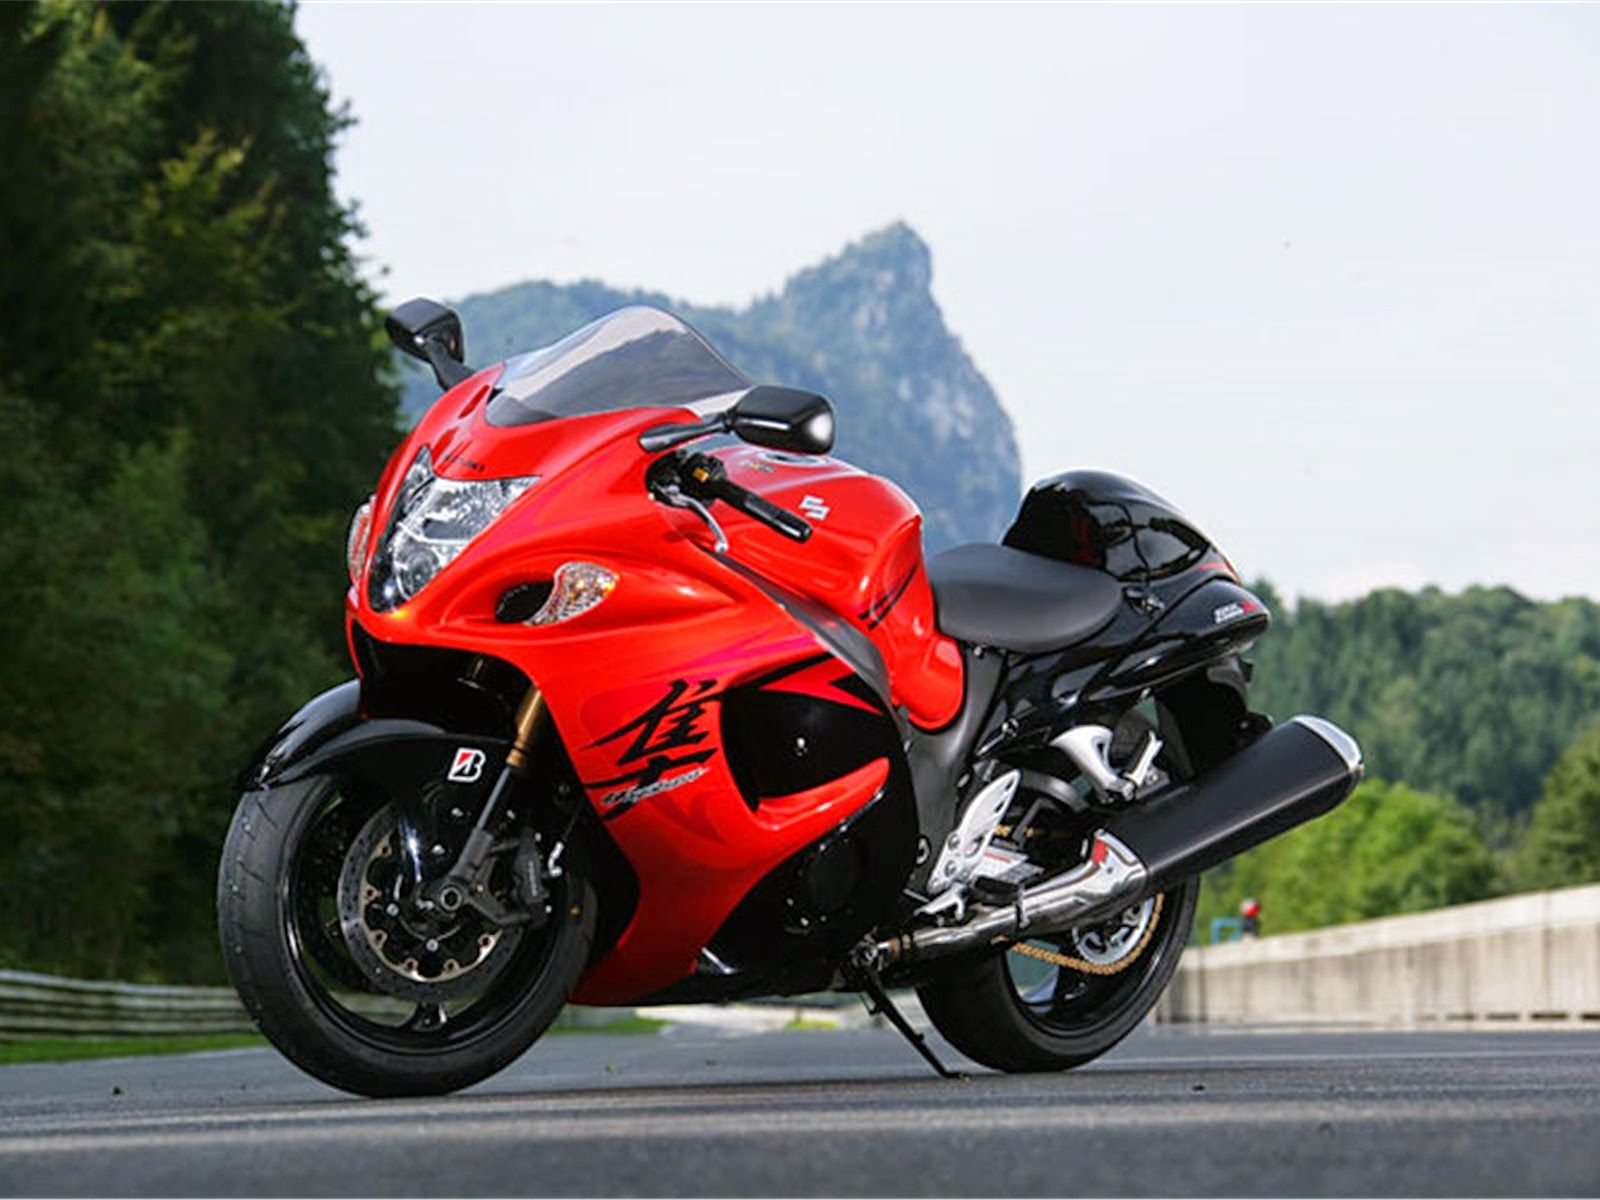 Hd wallpaper bike - Suzuki Hayabusa Top 10 Hd Wallpapers Specification Price Bike